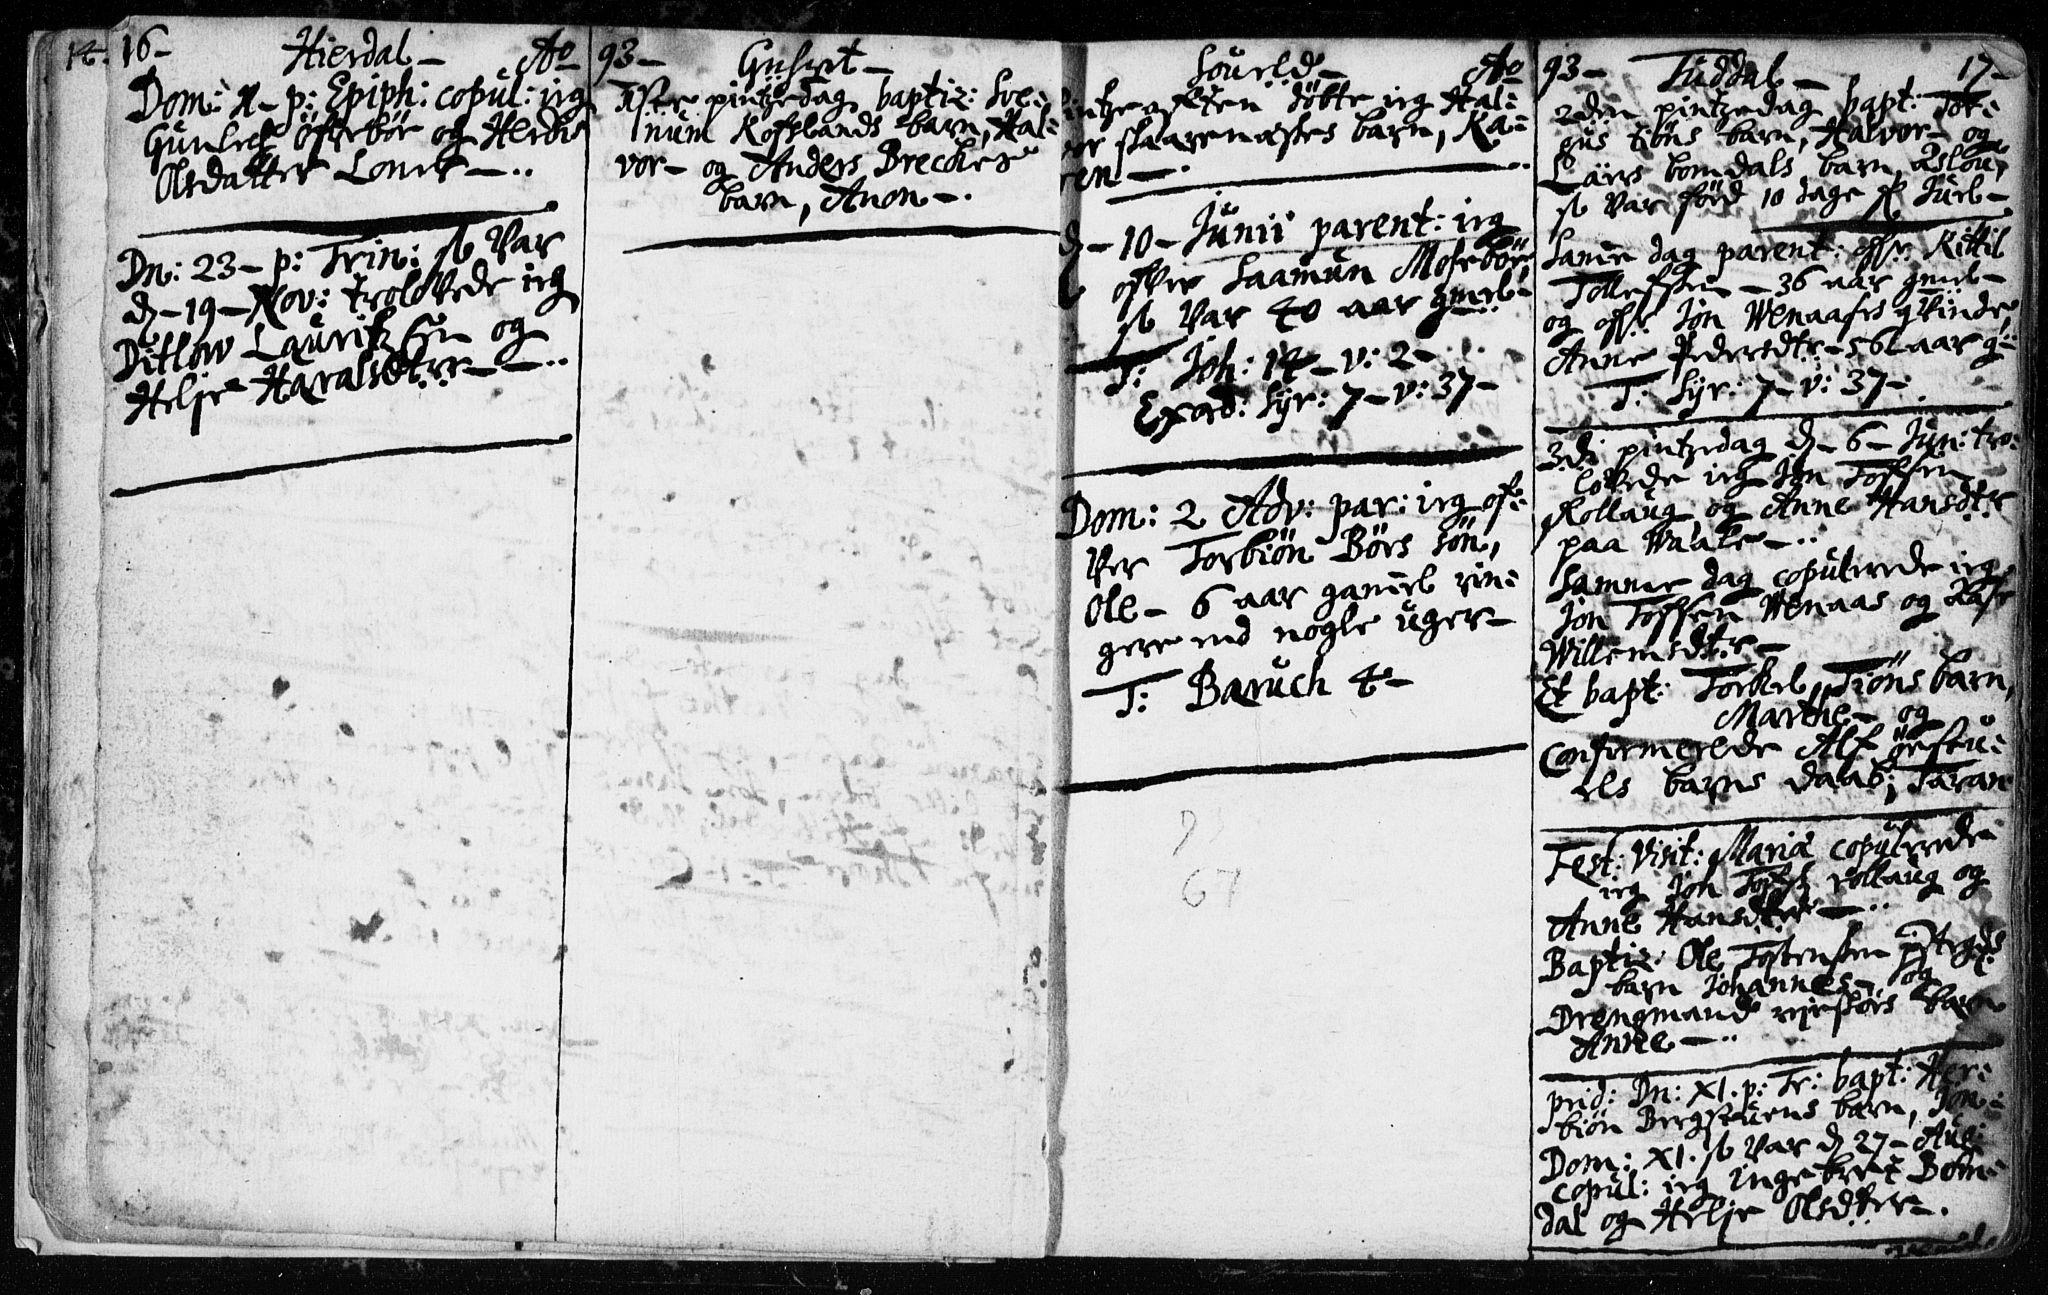 SAKO, Hjartdal kirkebøker, F/Fa/L0001: Ministerialbok nr. I 1, 1685-1714, s. 16-17